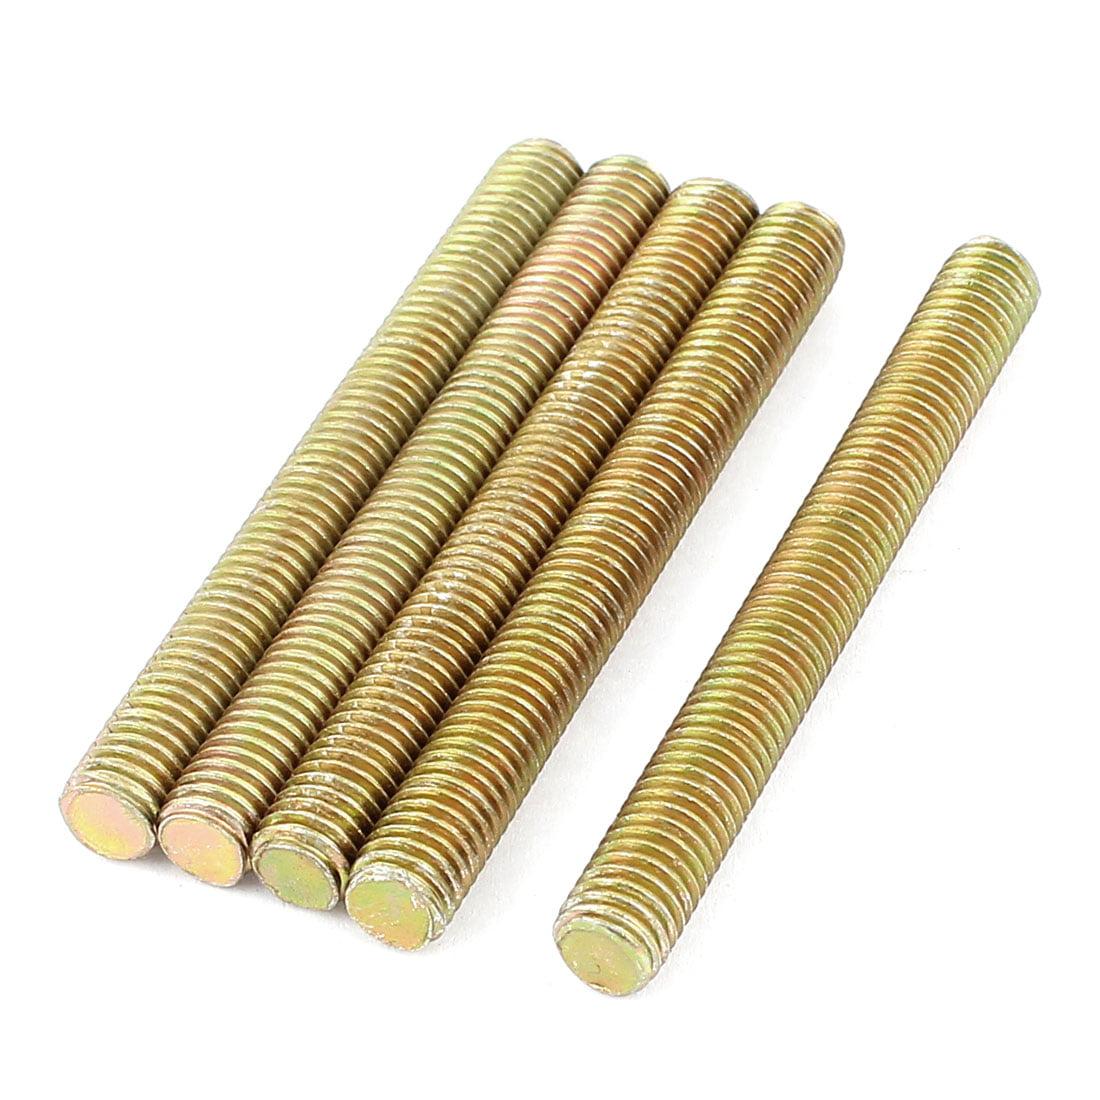 Unique Bargains 1.25mm Pitch M8 x 75mm Threaded Rod Bar Bolt Bronze Tone 5 Pcs